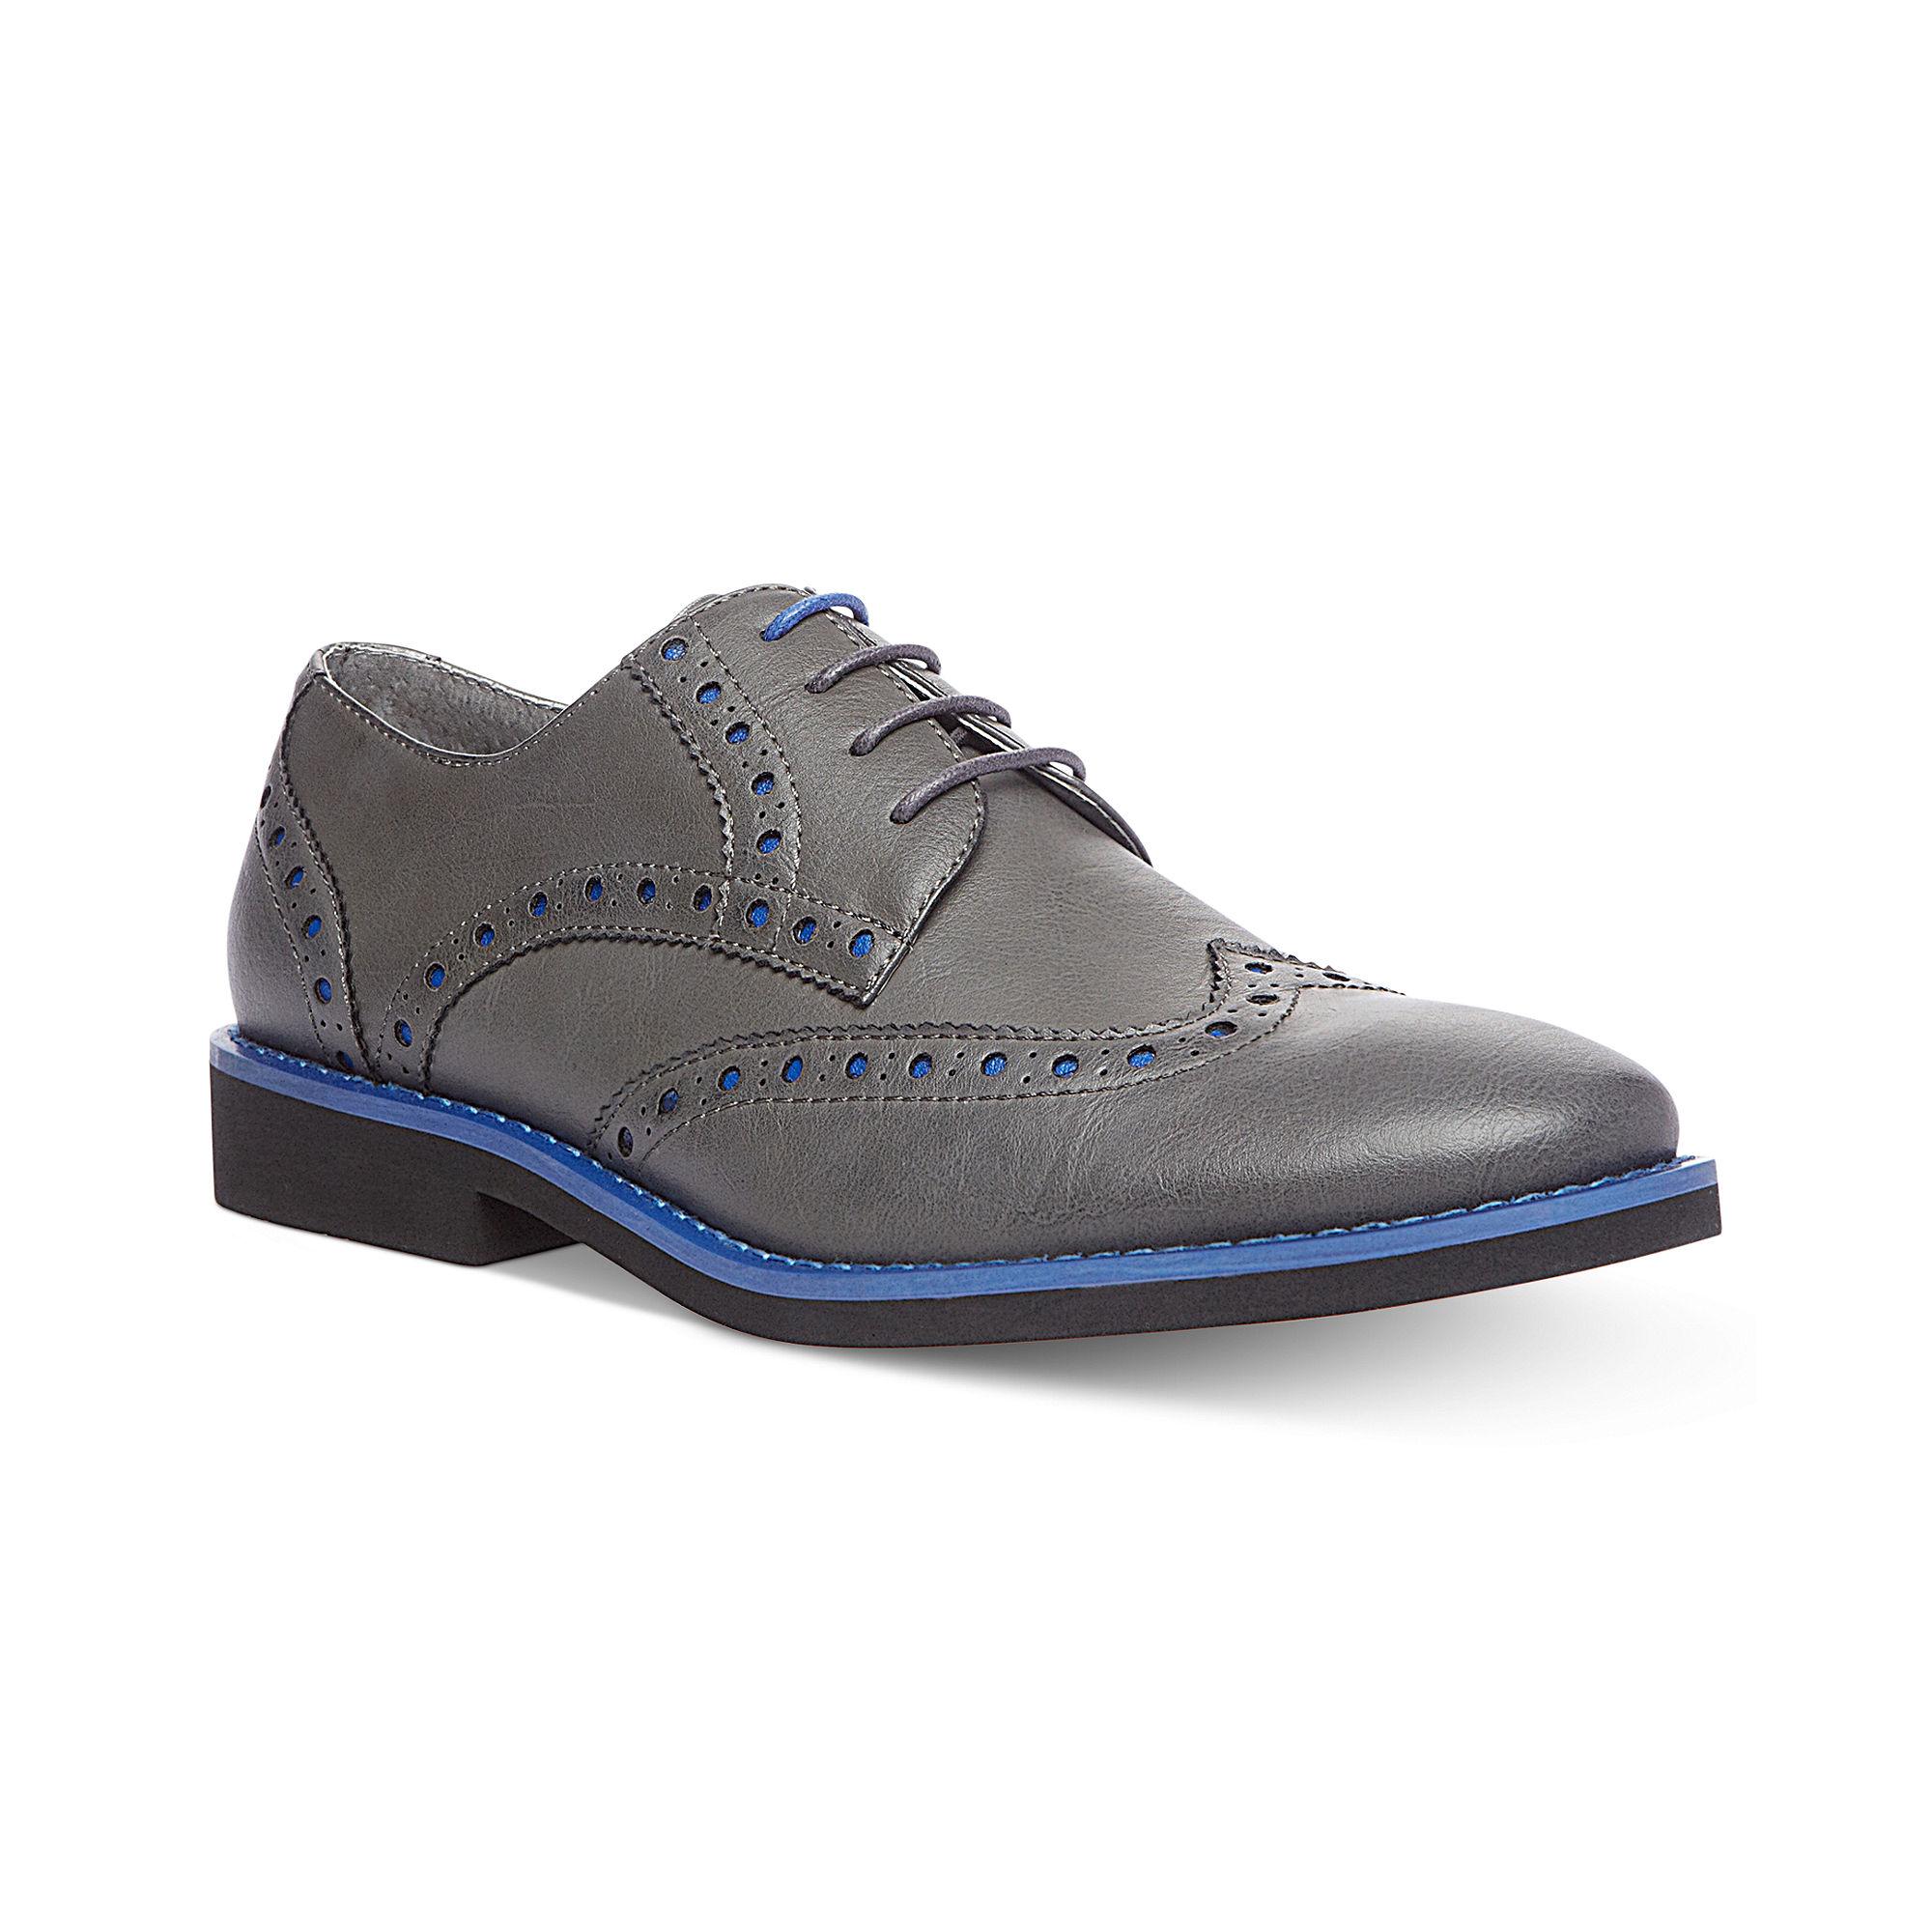 Macy S Men S Wingtip Steve Madden Shoes